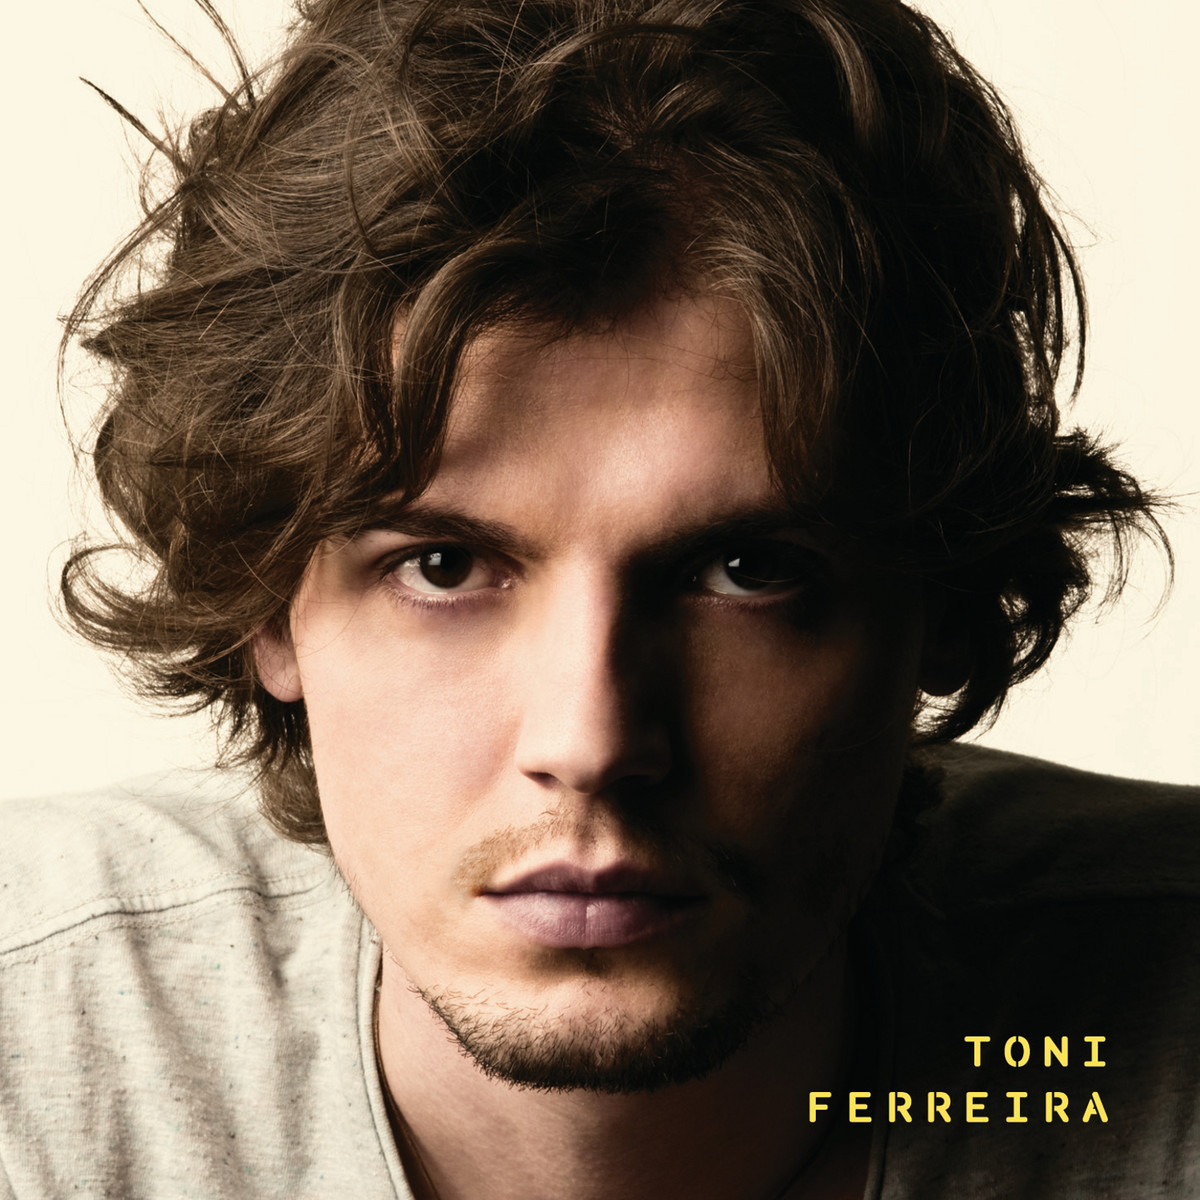 Capa do álbum Toni Ferreira